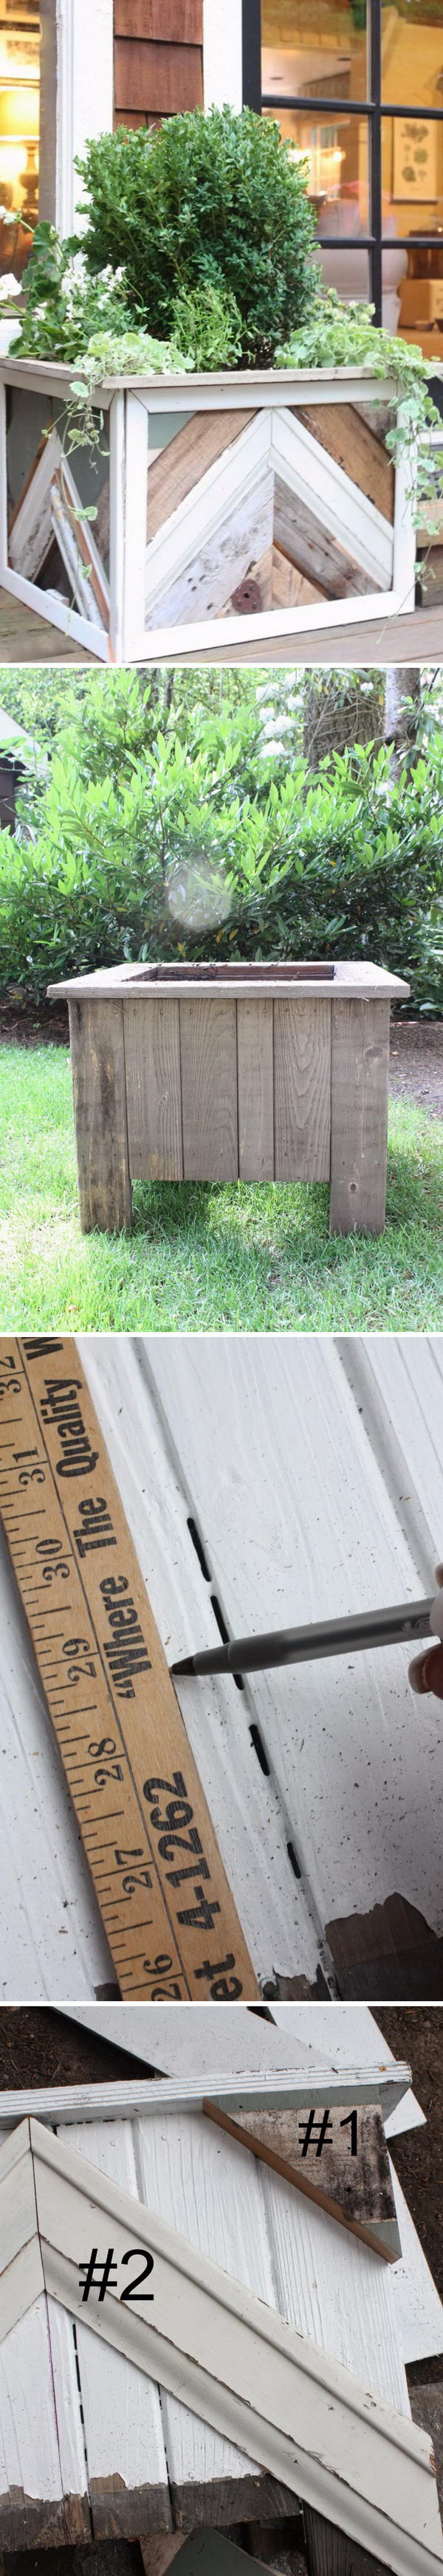 Reclaimed Wood Chevron Stripe Planter Boxes.